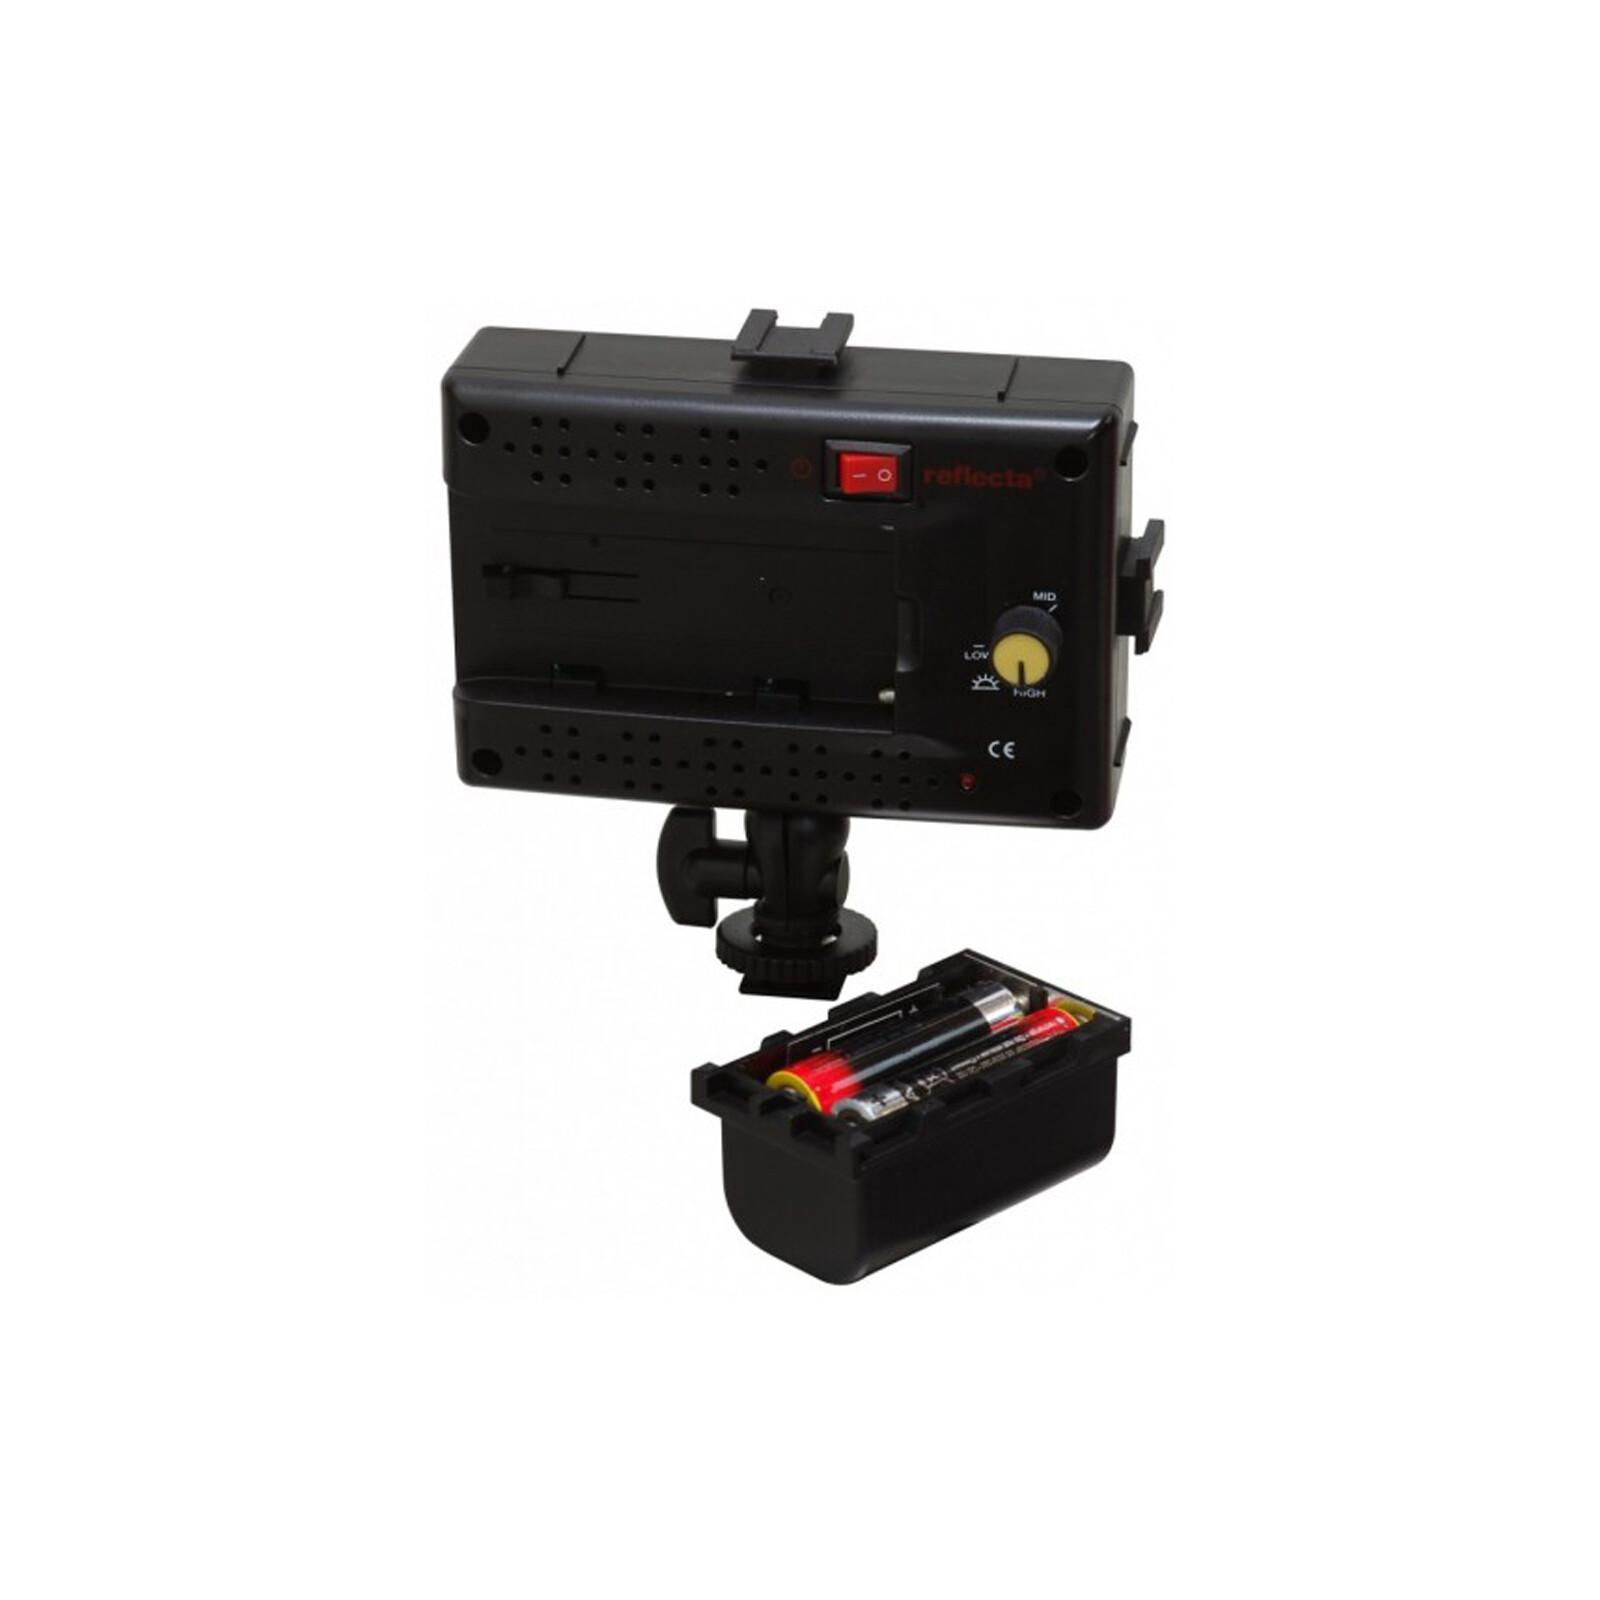 Reflecta RPL-105 LED Videoleuchte